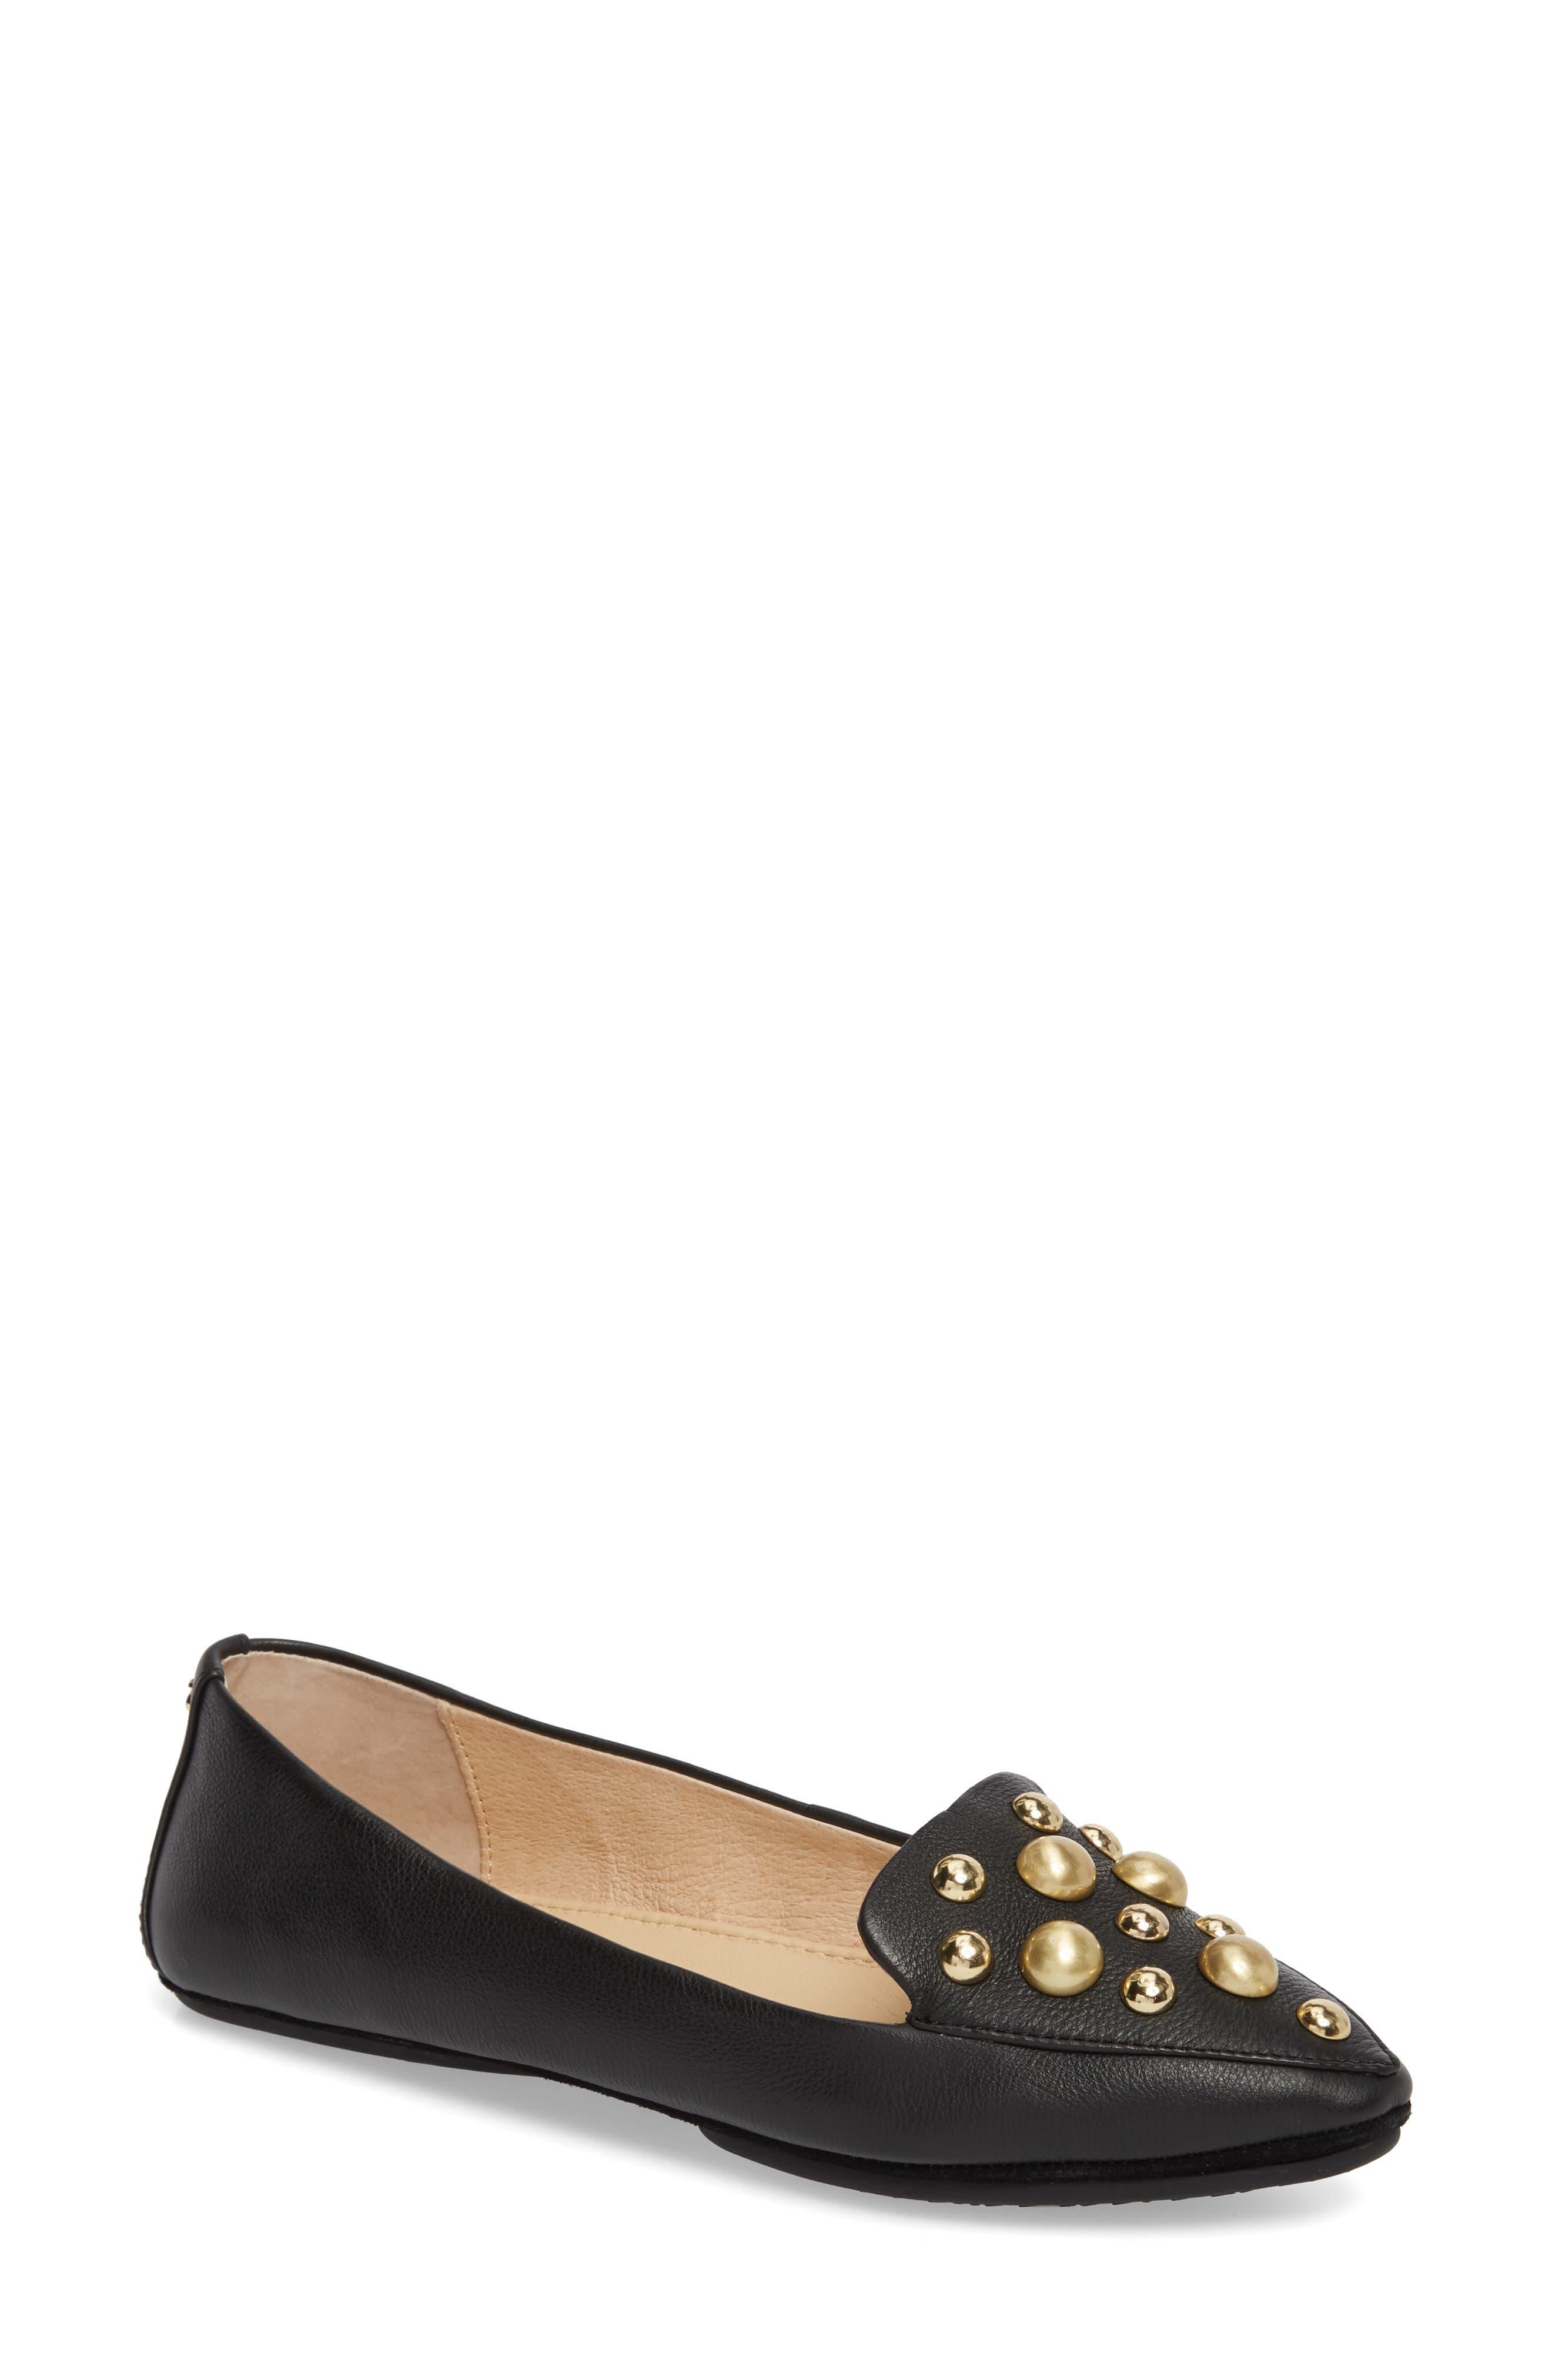 Vera Studded Loafer,                             Main thumbnail 1, color,                             Black/ Black Leather